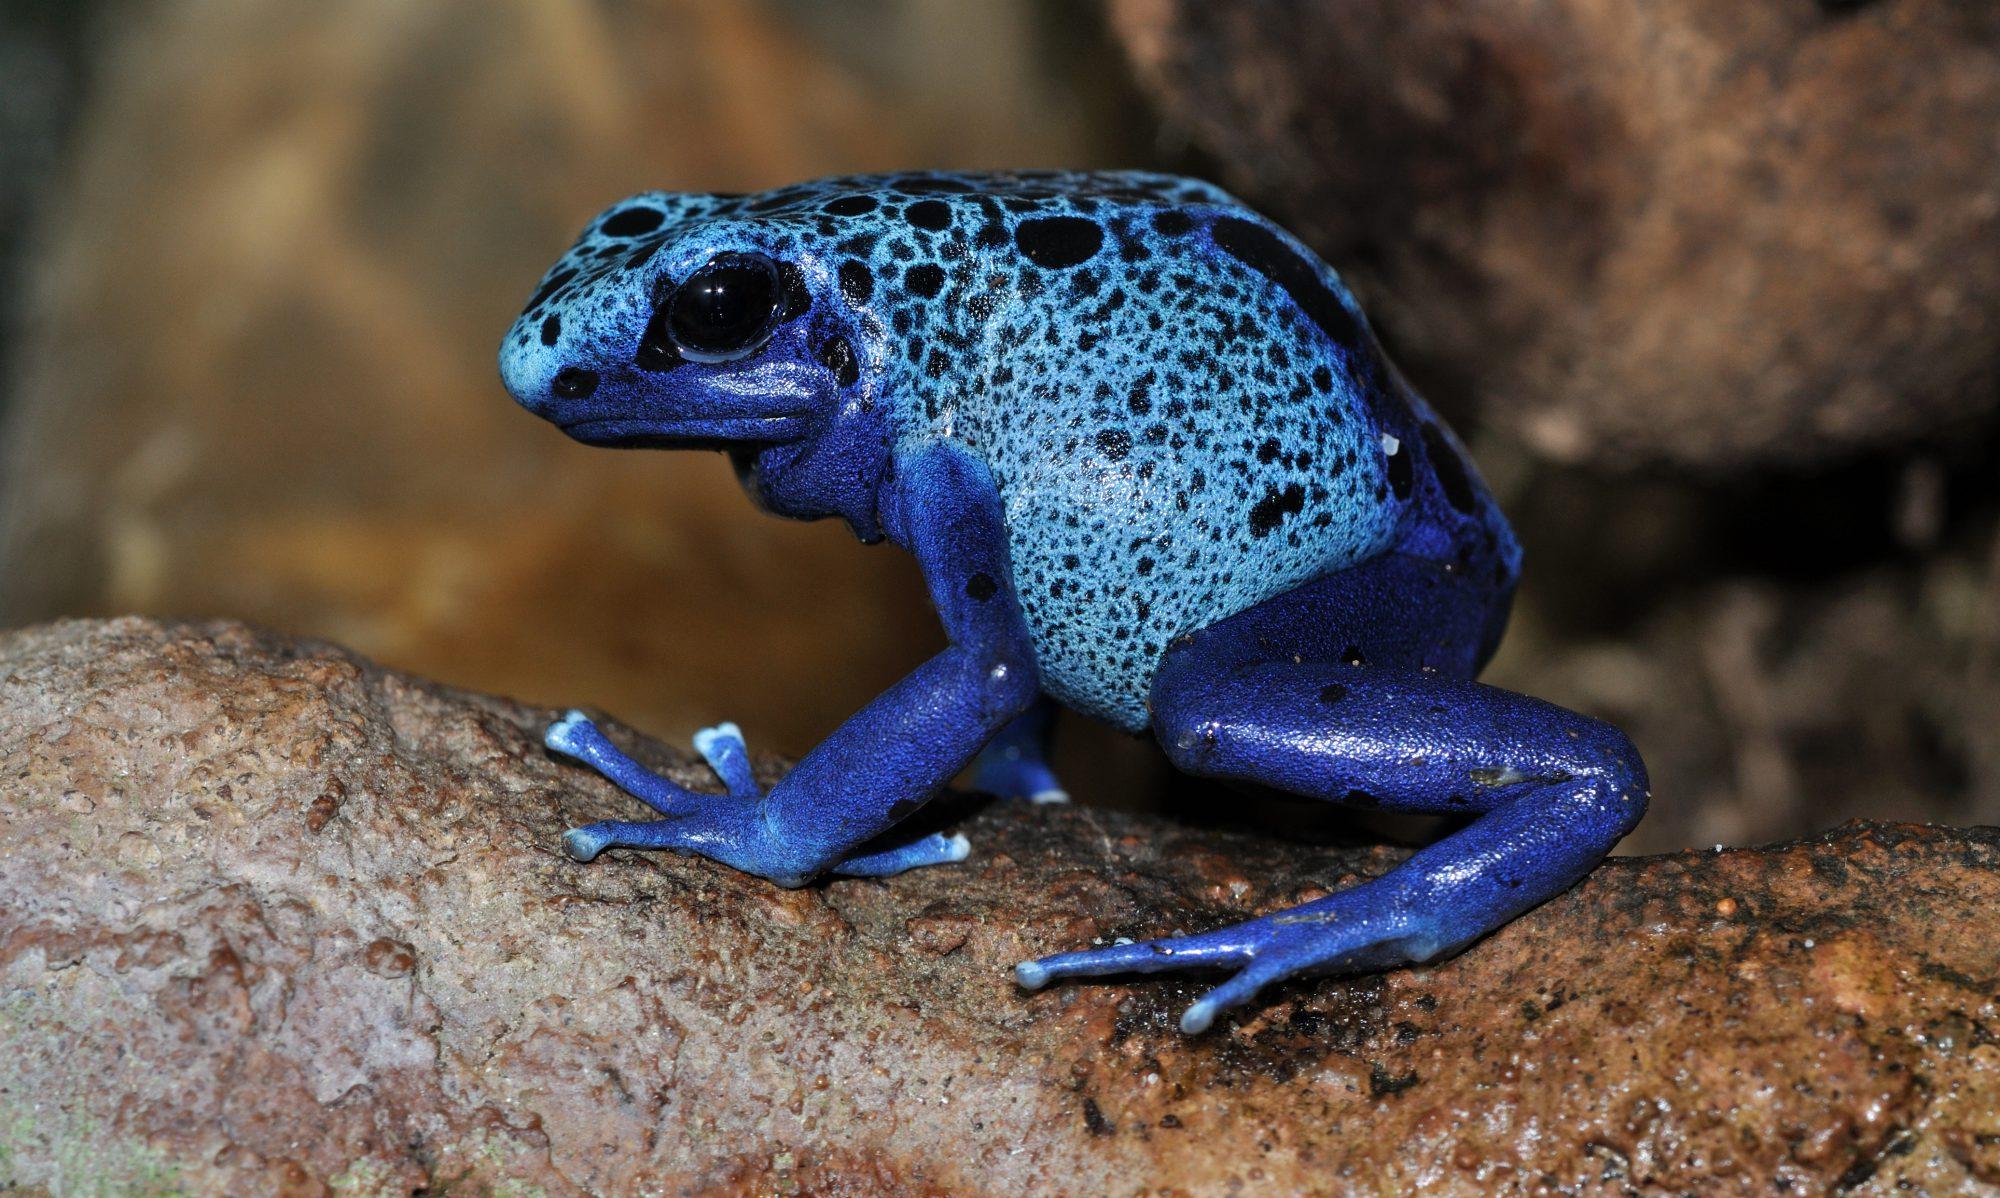 Blue frog photo